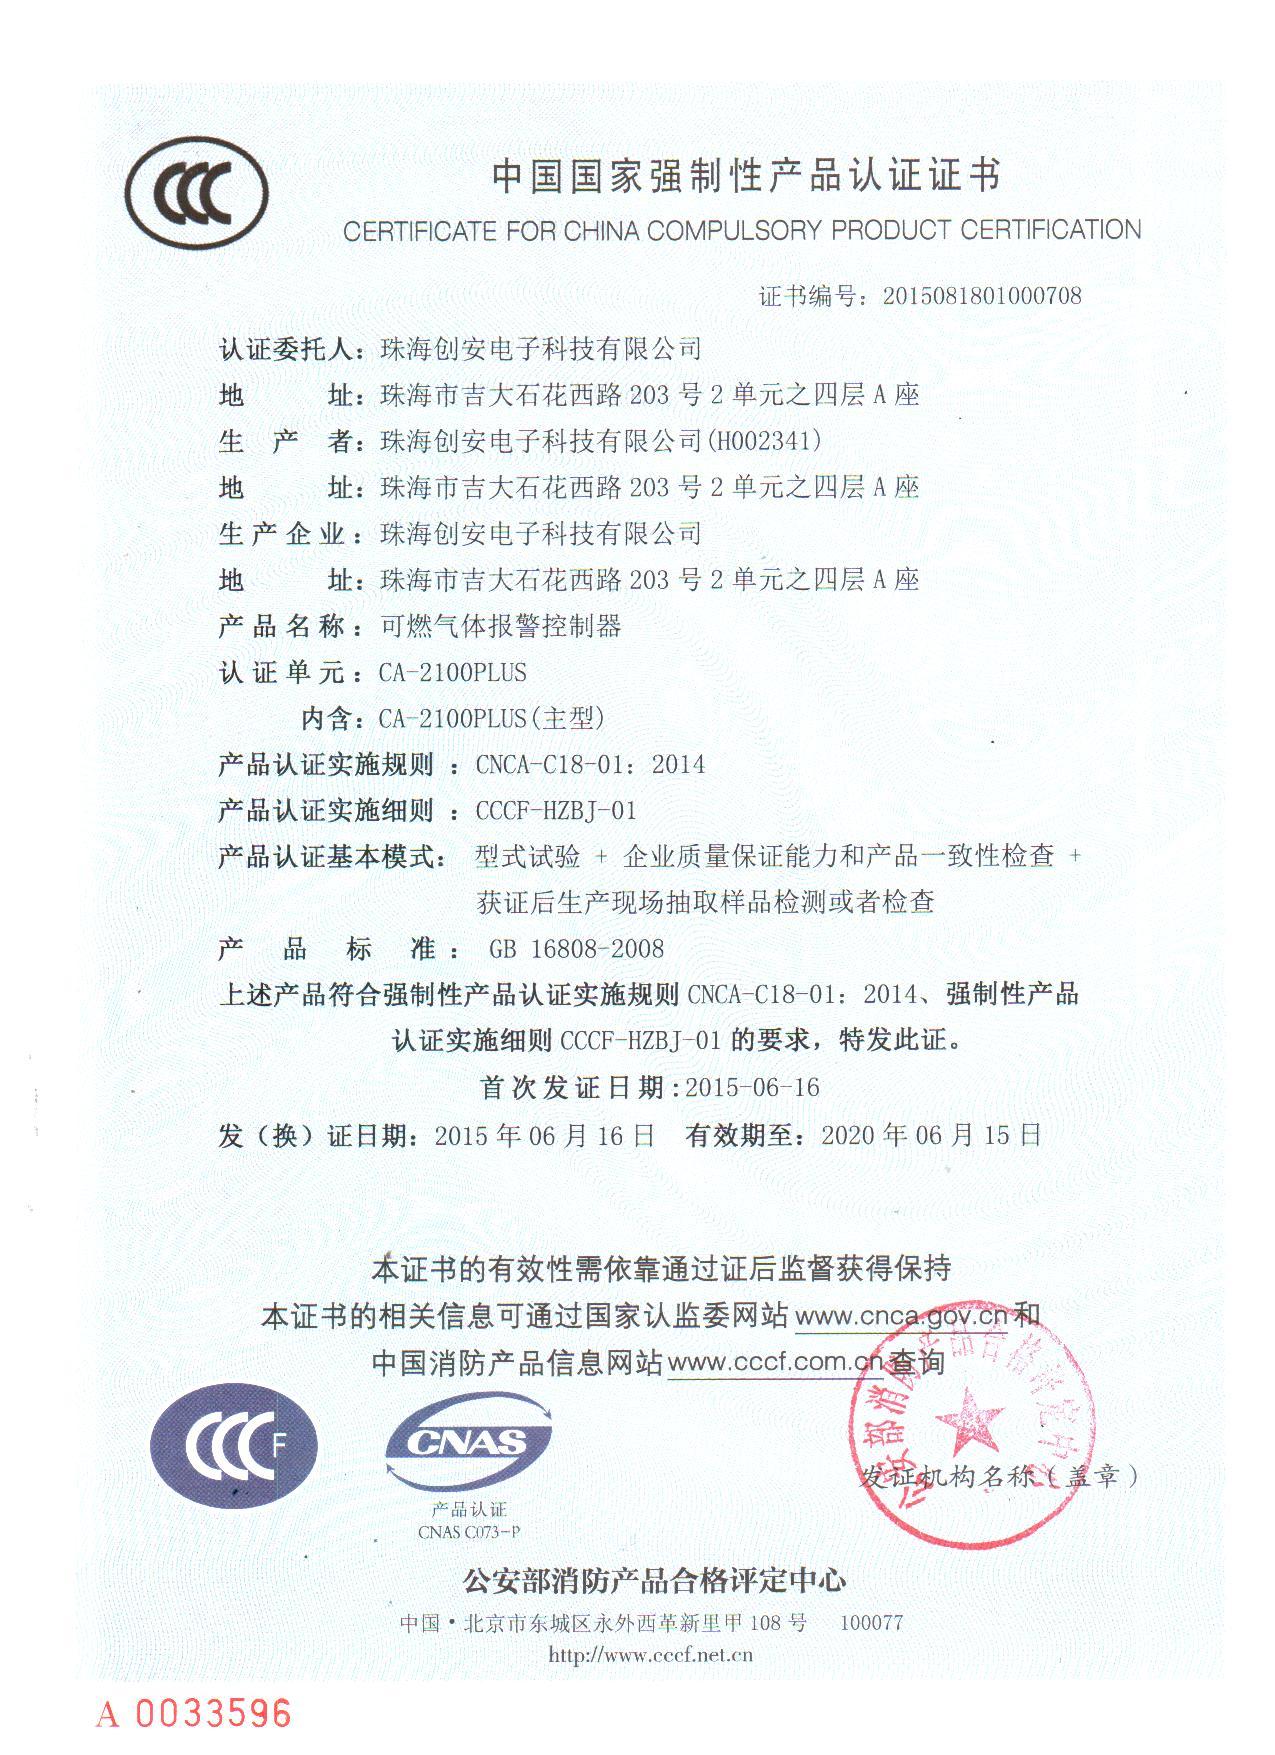 3C认证证书CA-2100 PLUS.jpg